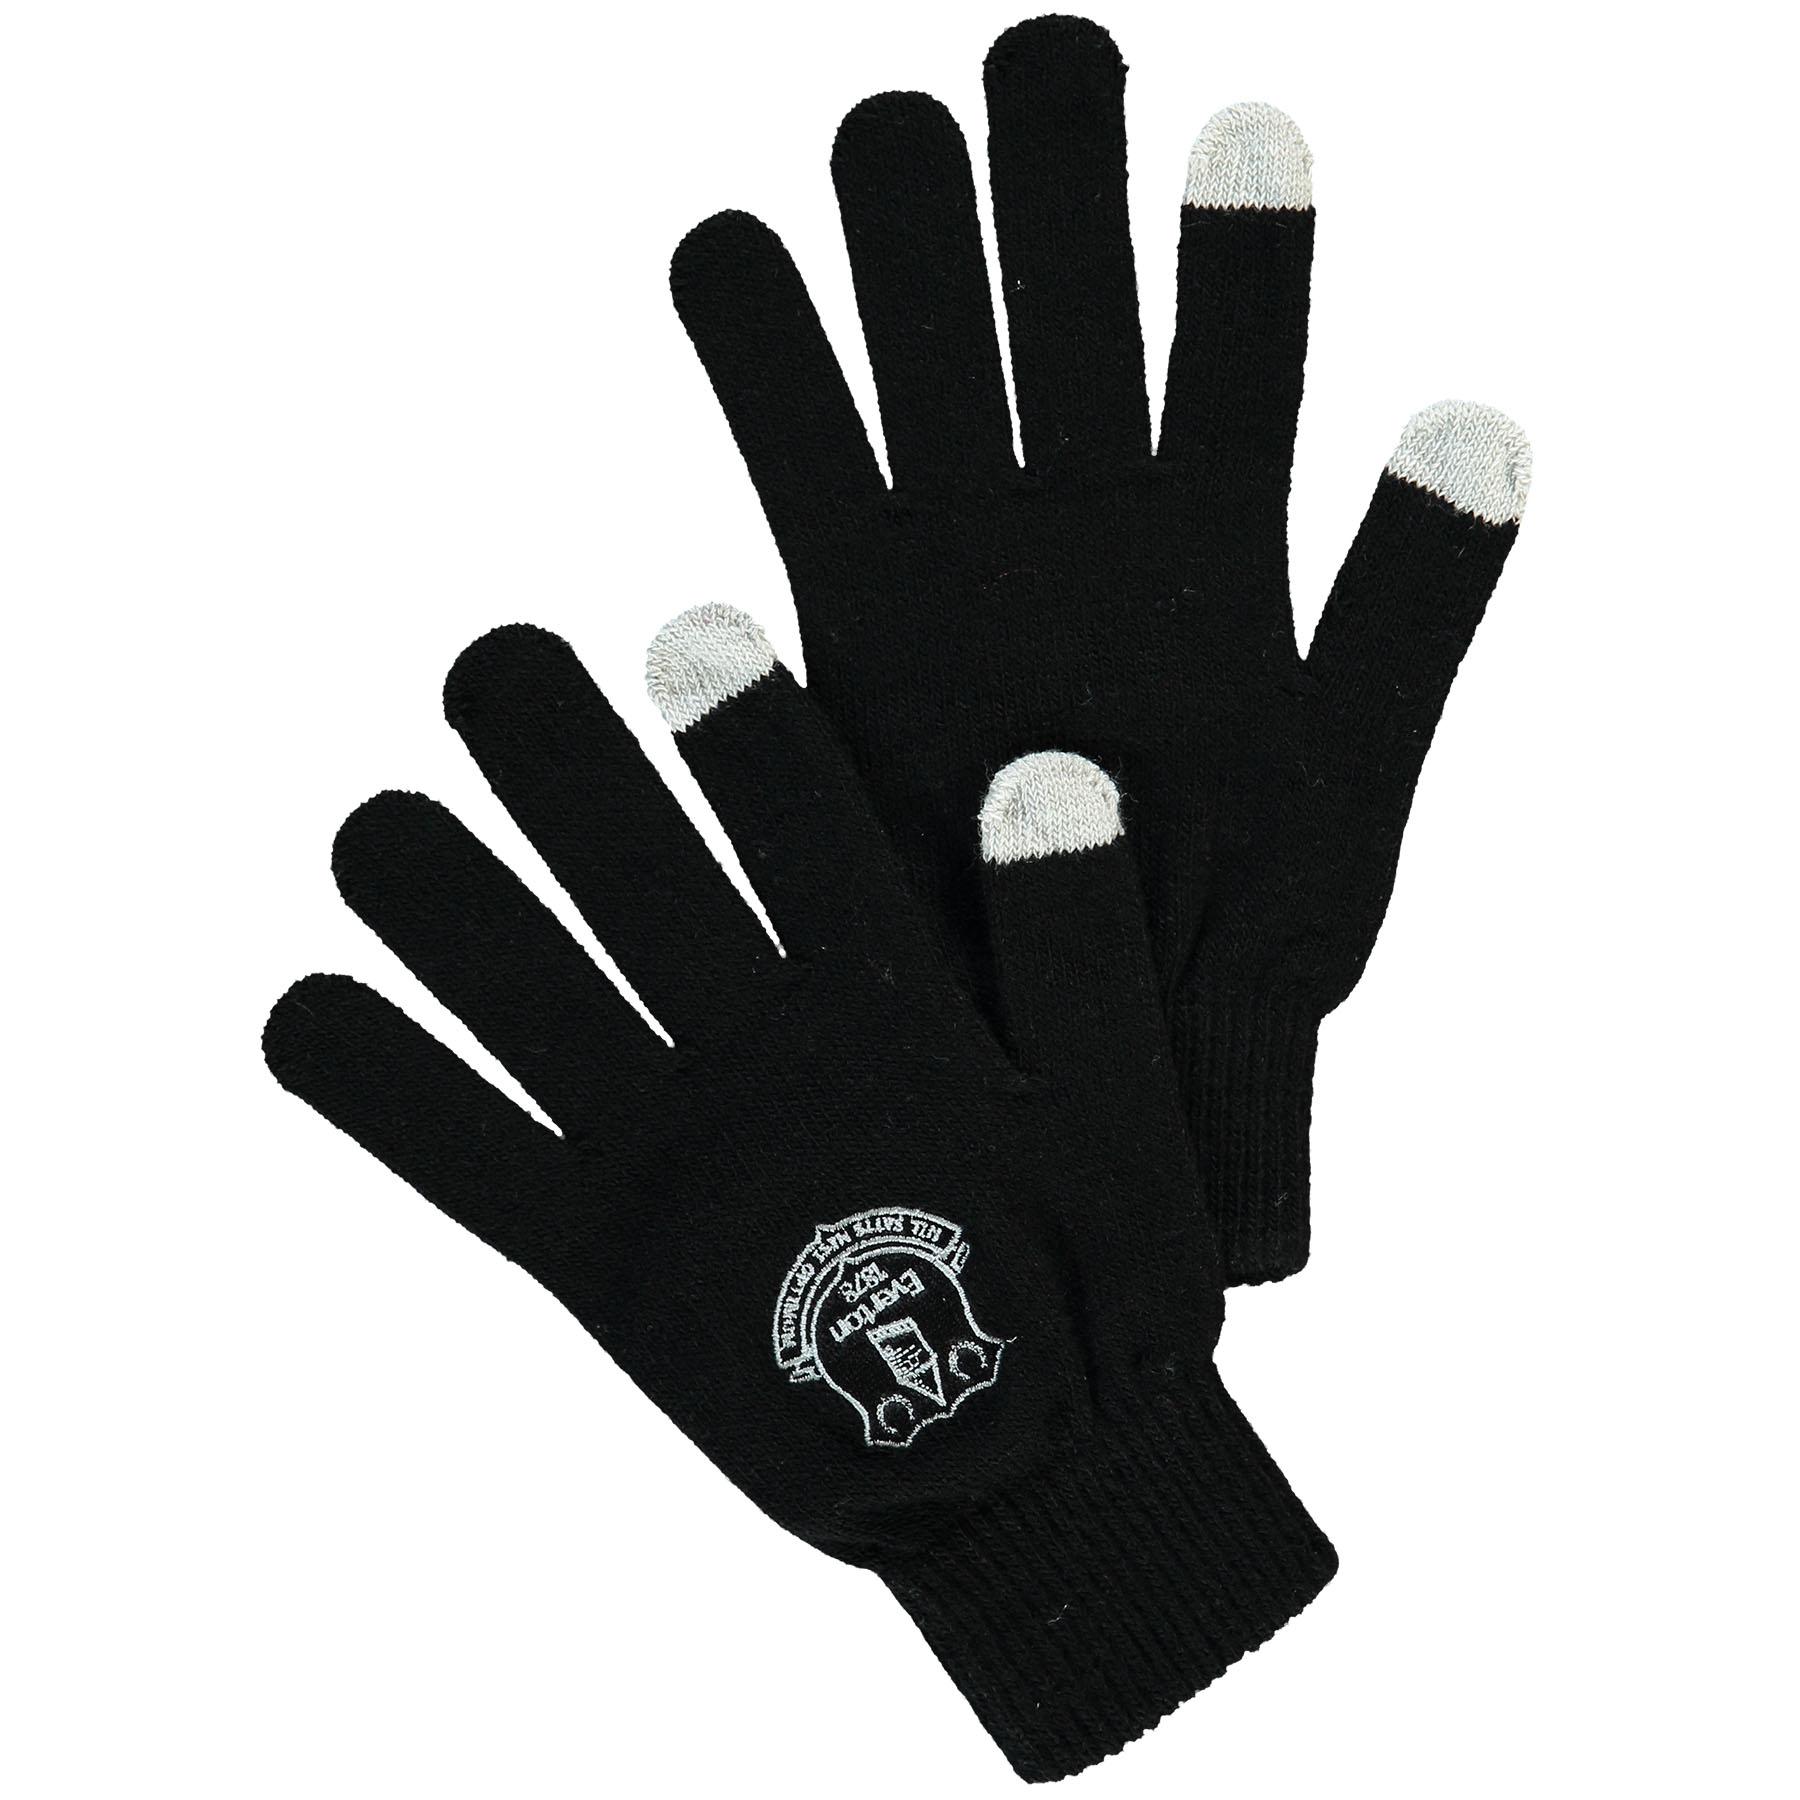 Everton Core Touchscreen Gloves - Black - Adult